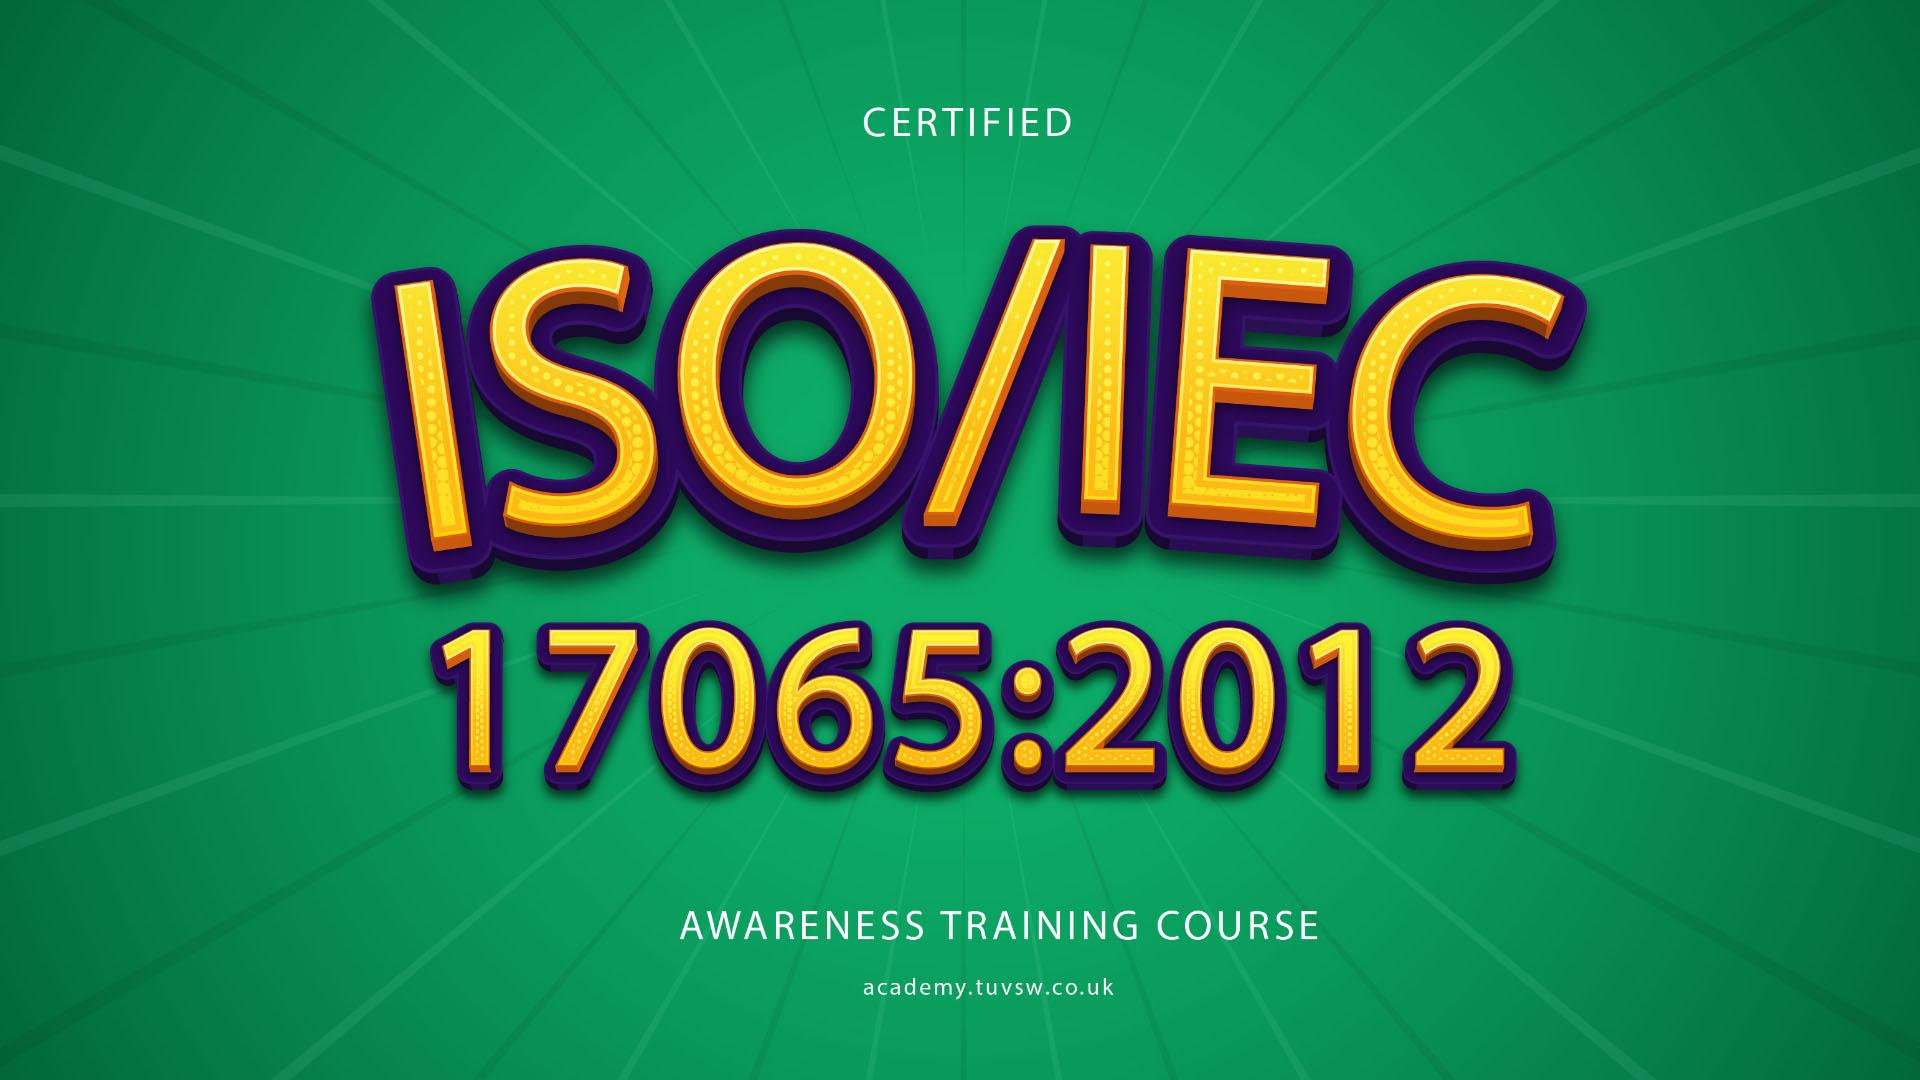 ISO/IEC 17065:2012 Awareness Training Course